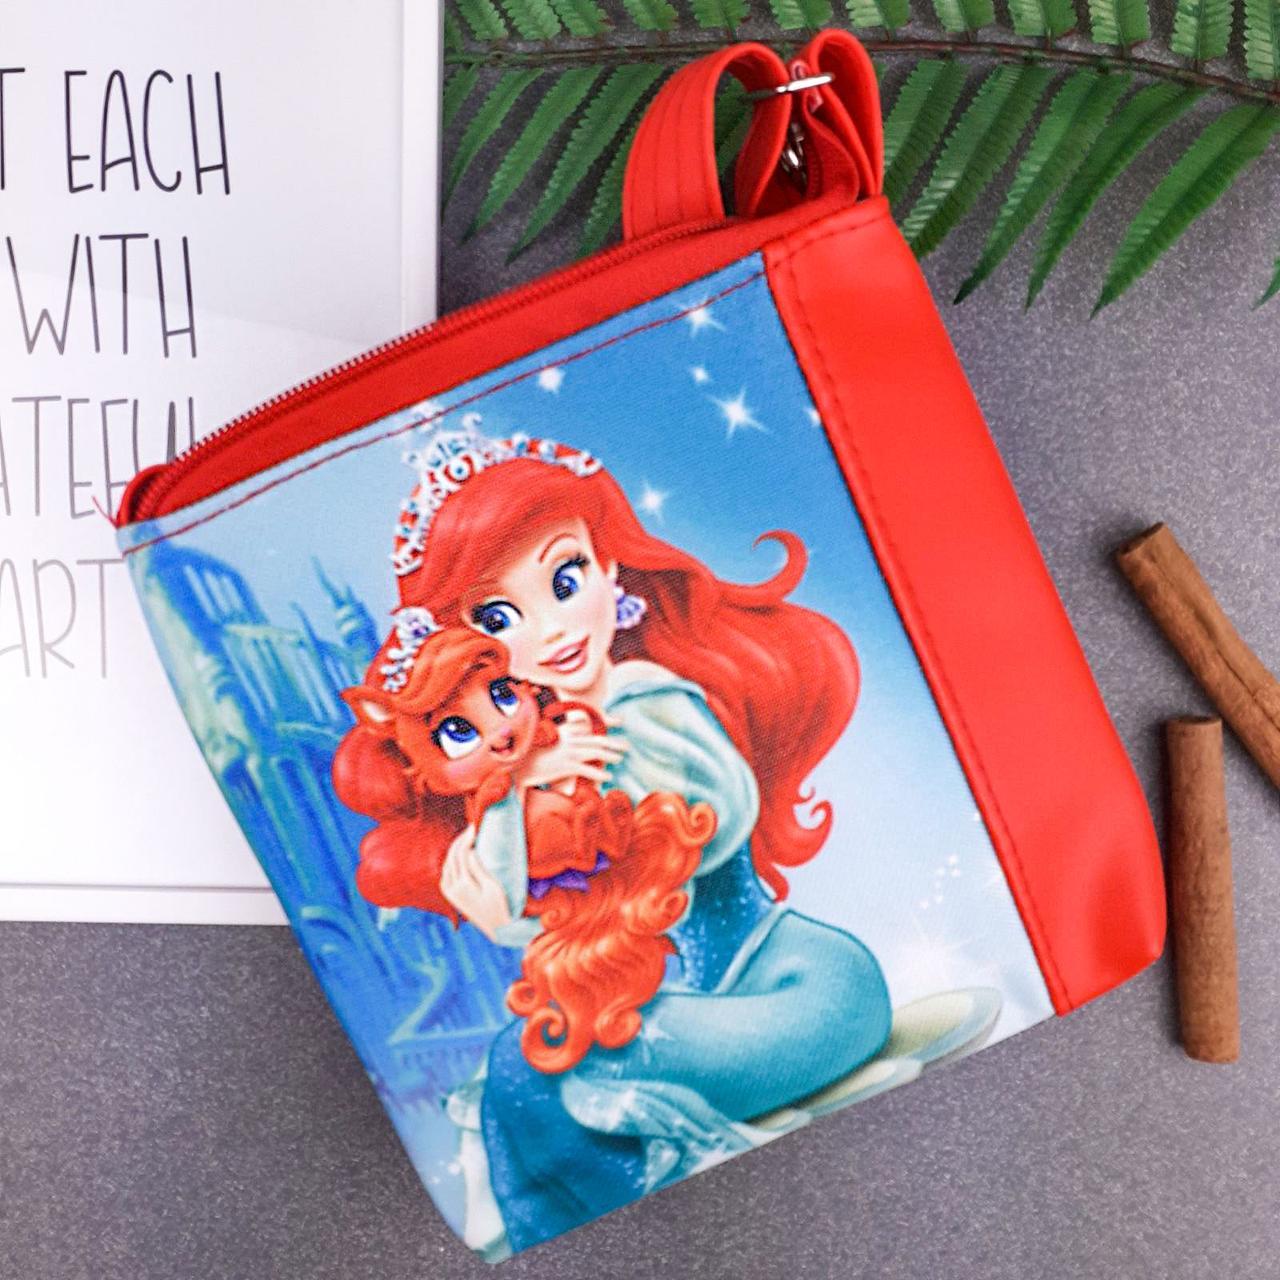 Сумка Moderika Mini Miss красная с рисунком Ариэль с Питомцем (55382)